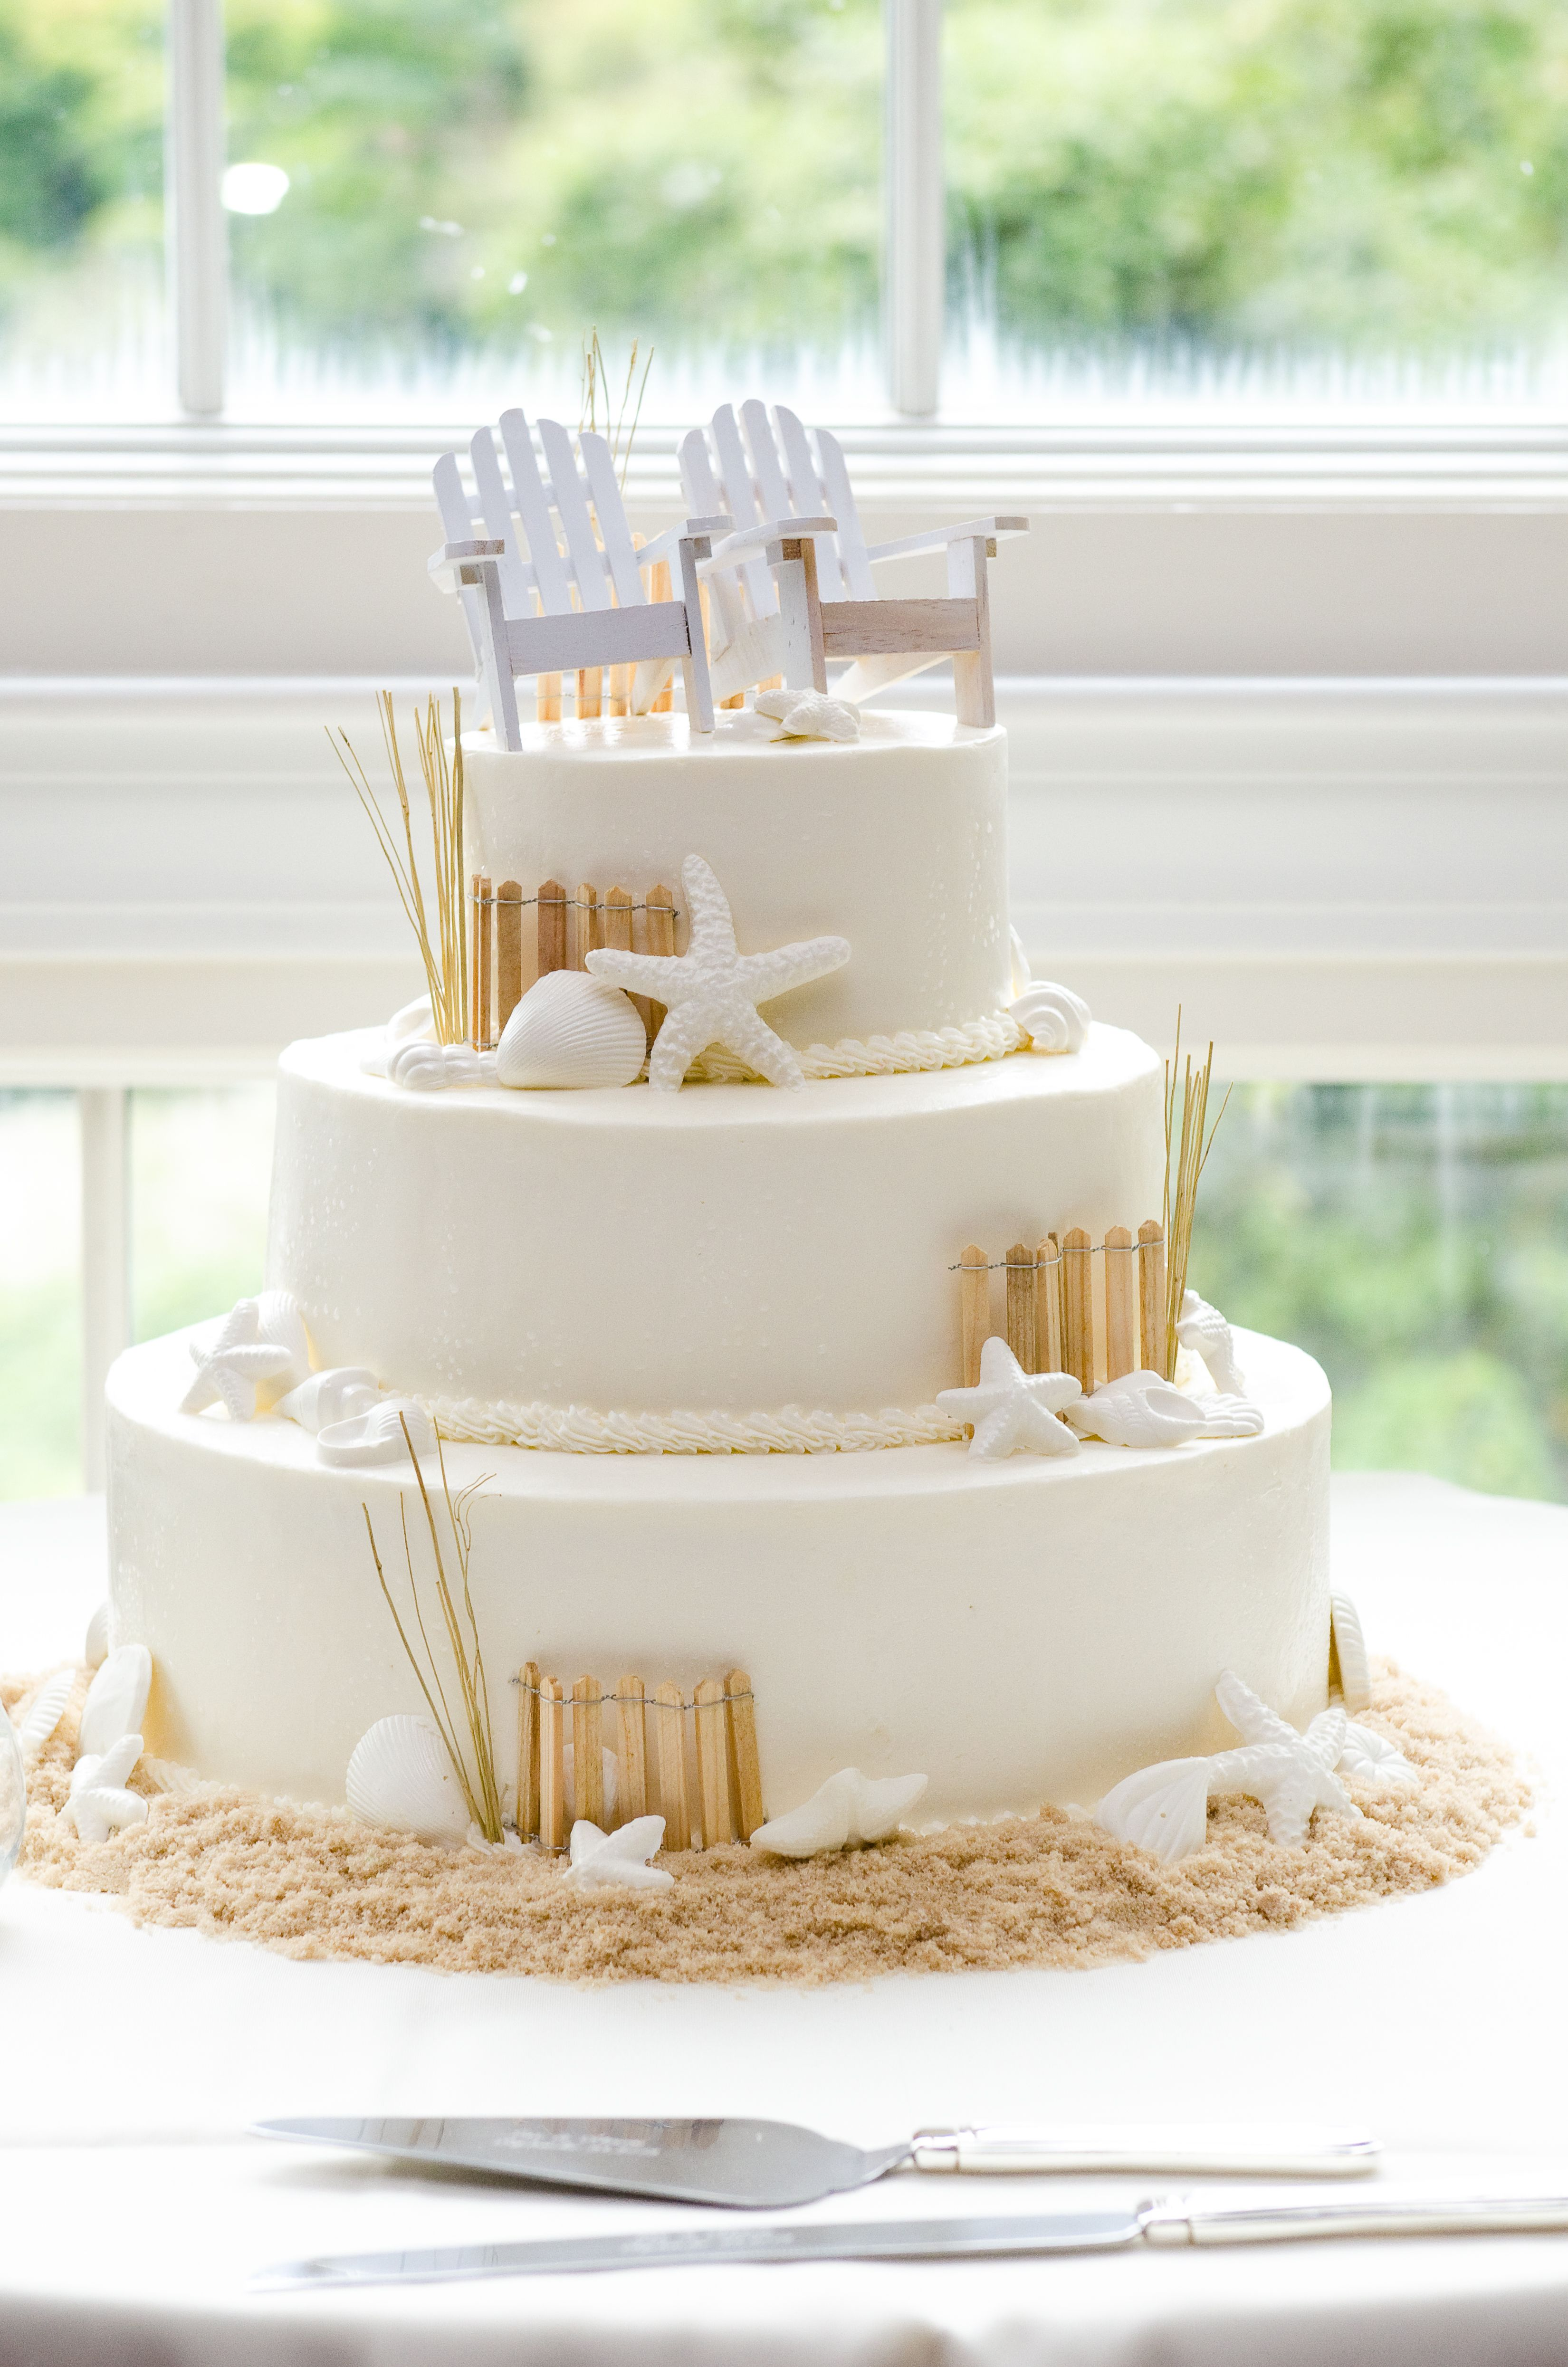 Bride & Groom Spring 2014 | Beach themed weddings, Themed wedding ...